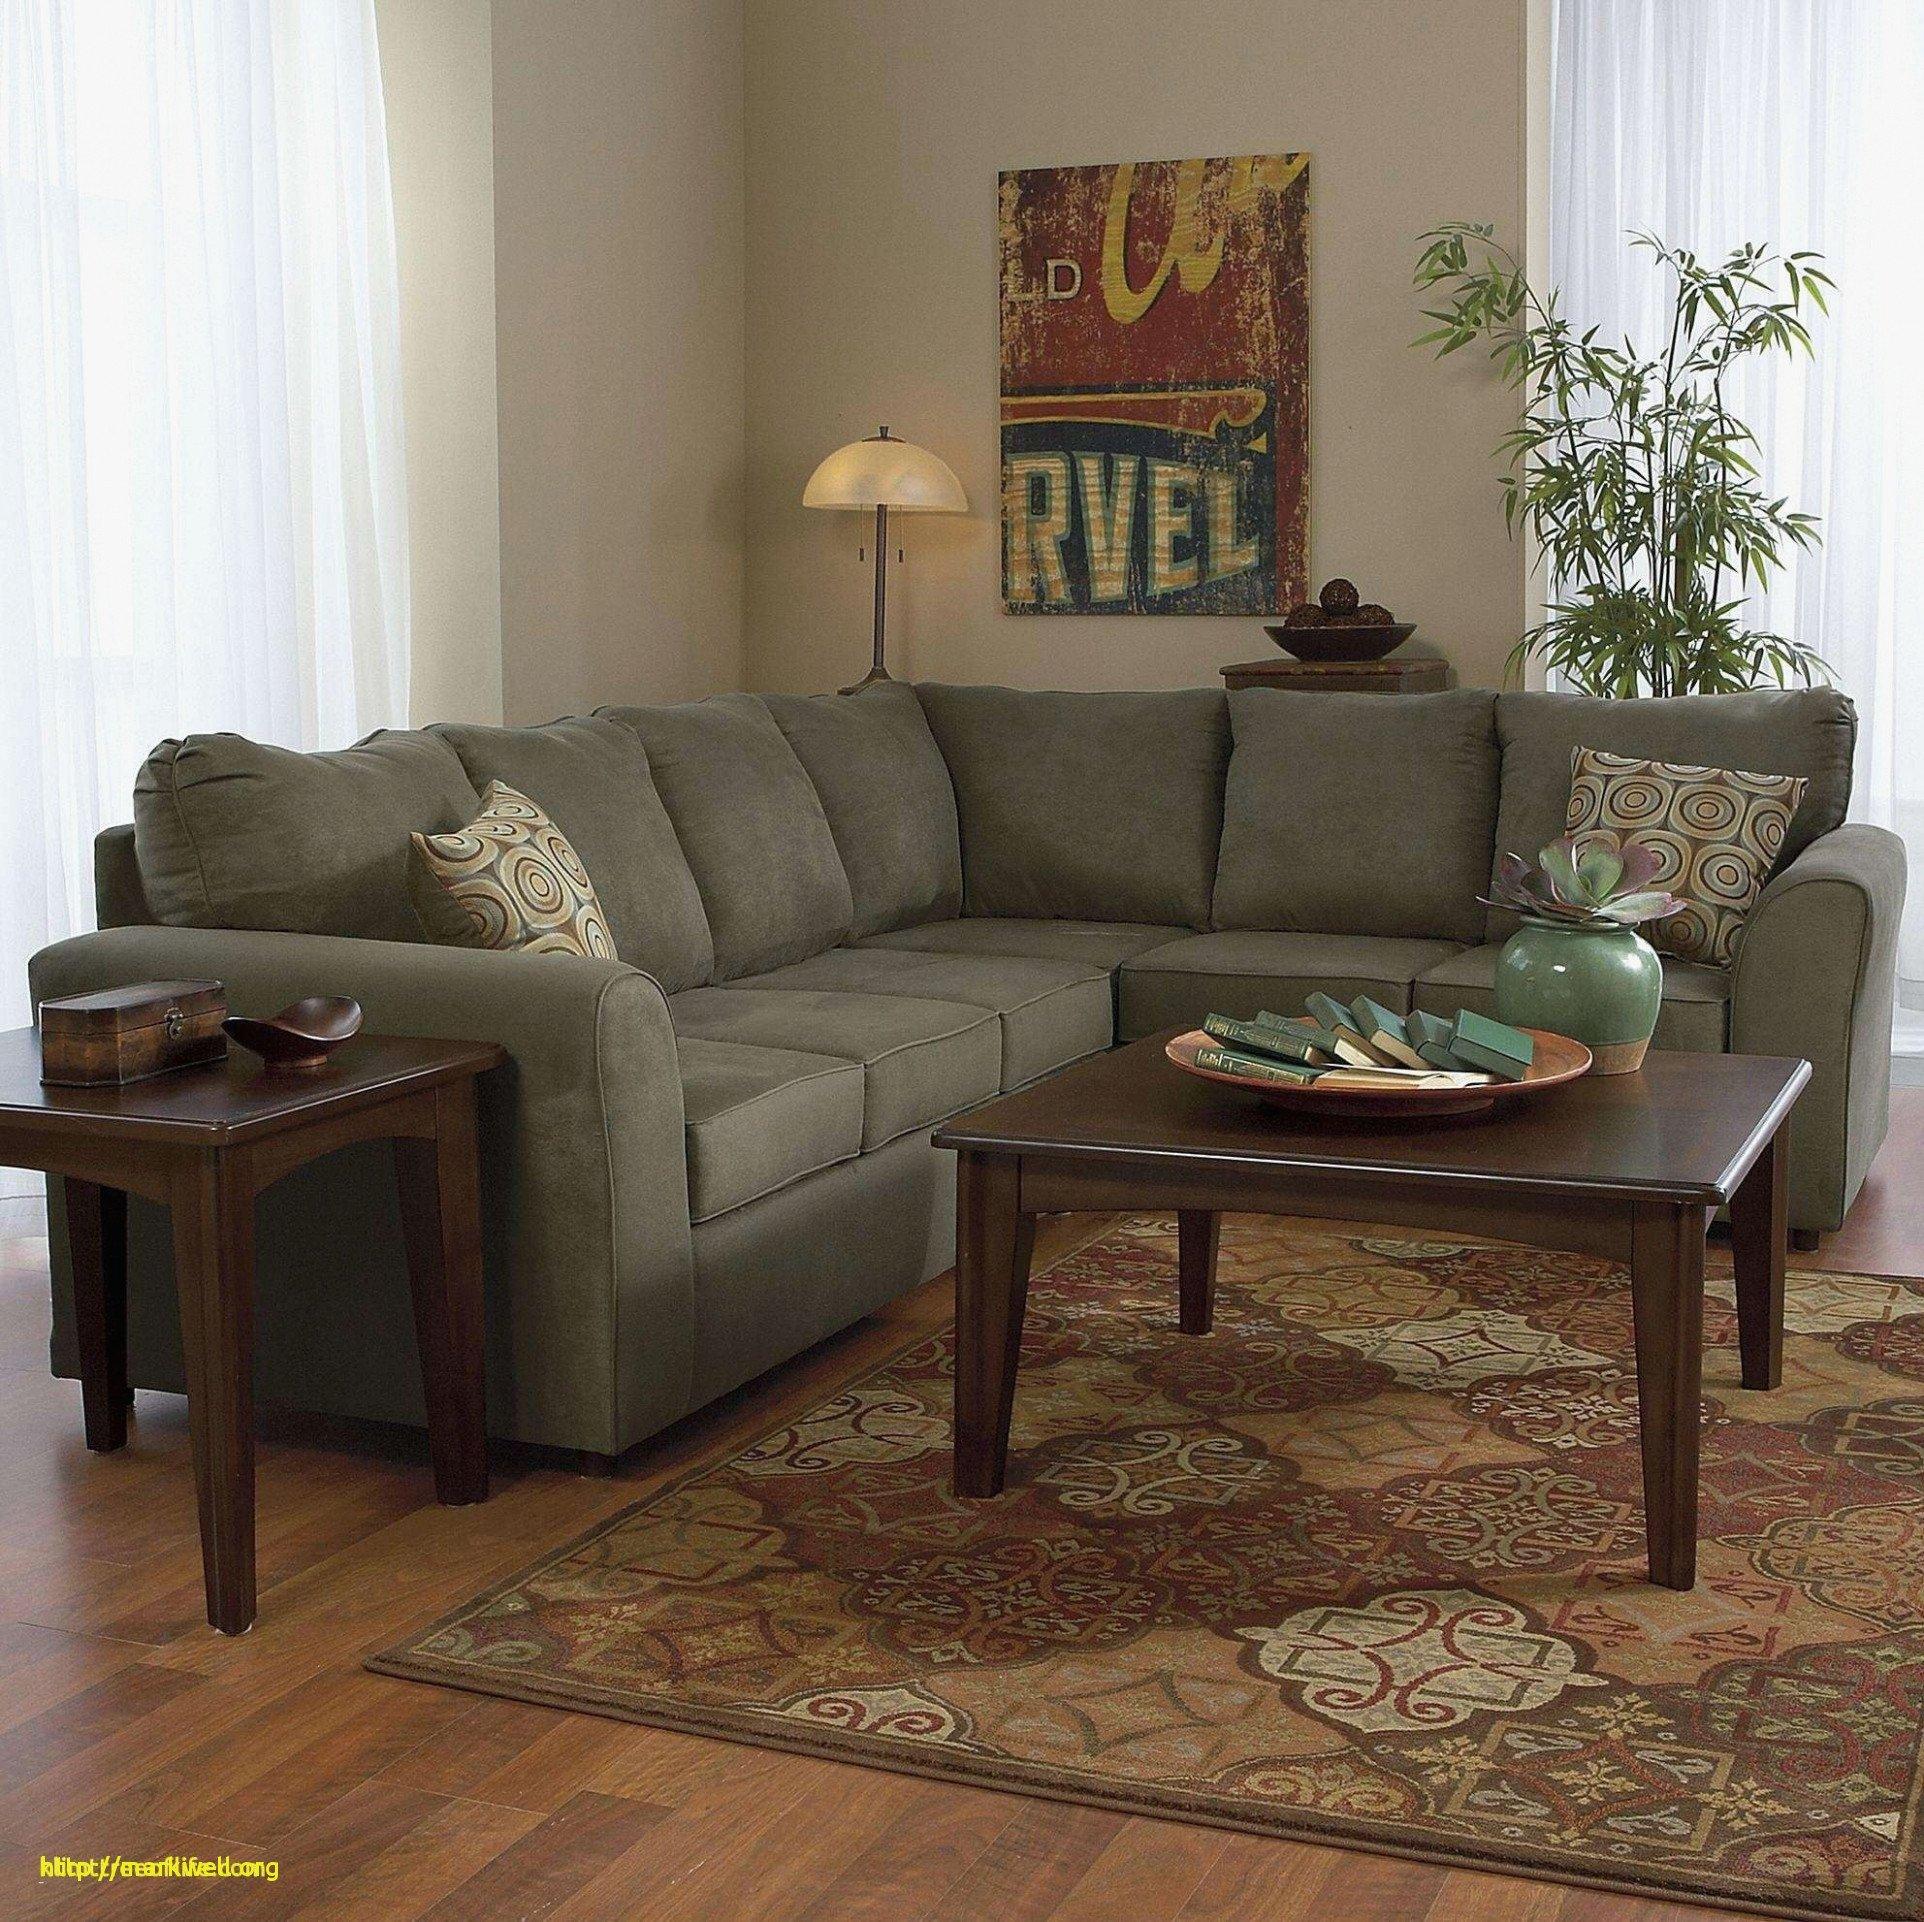 living room accent furniture best of design your bedroom new top best living room accent furniture 0d of living room accent furniture